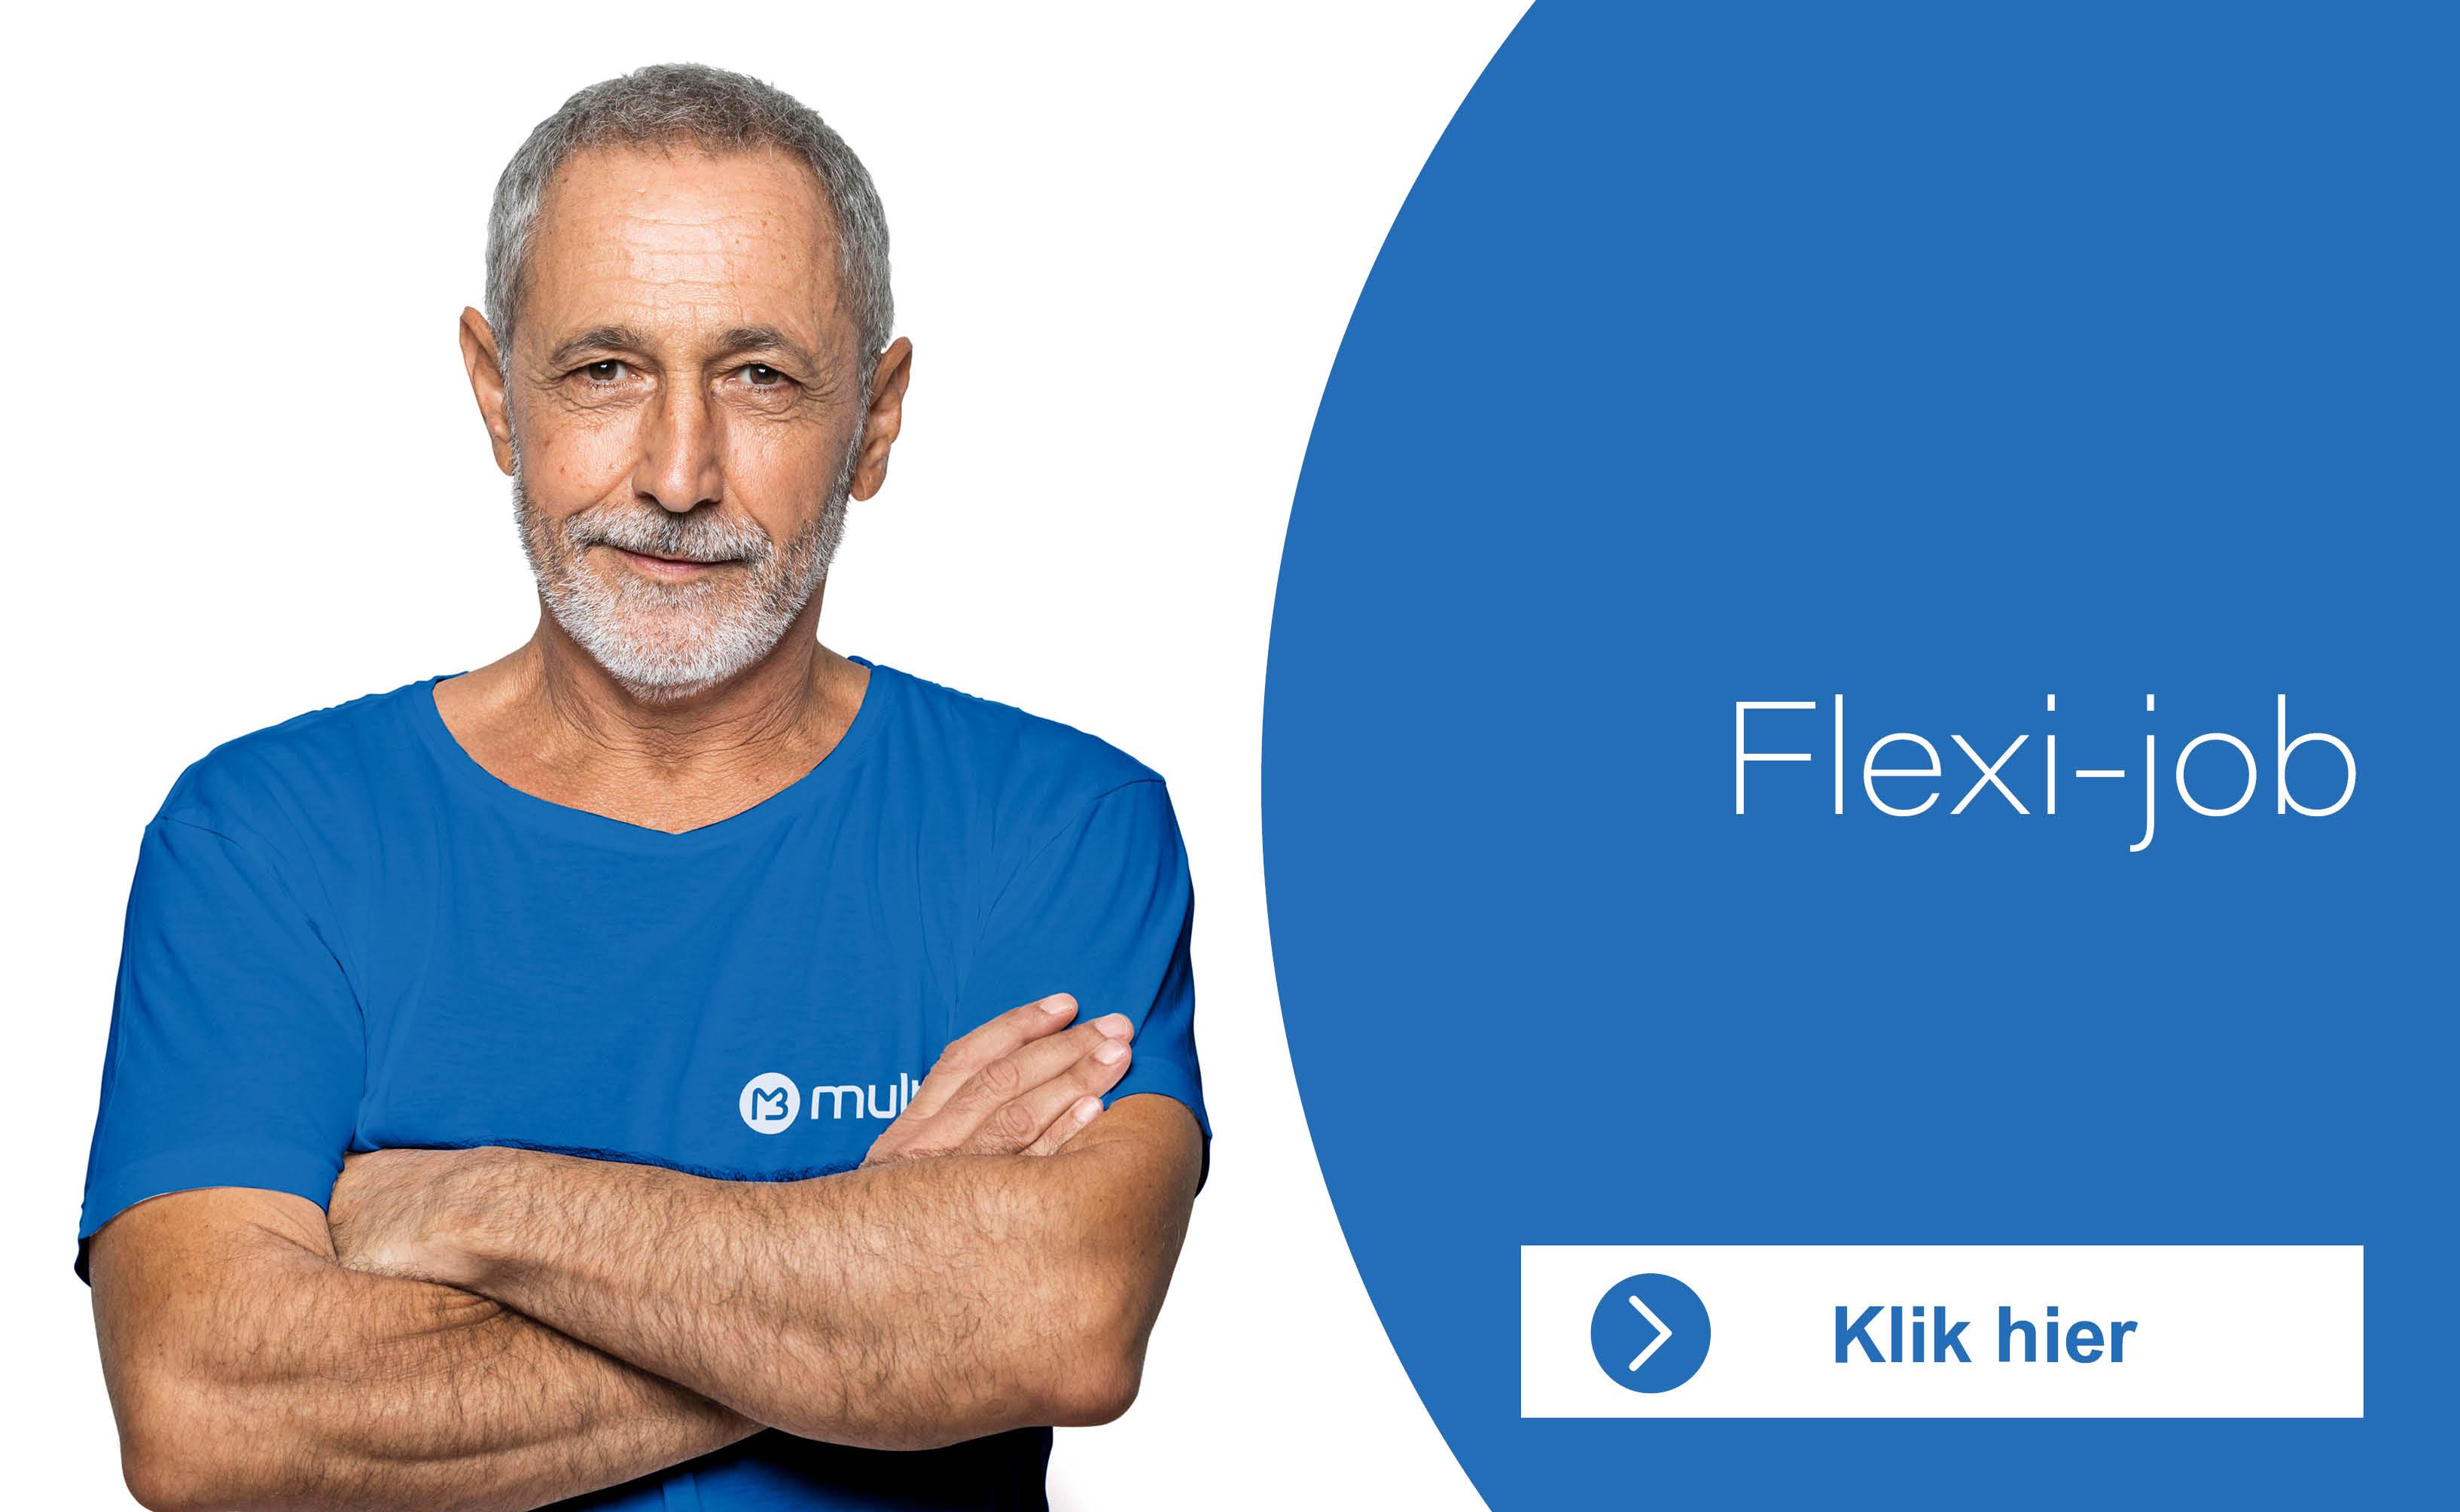 Flexijob